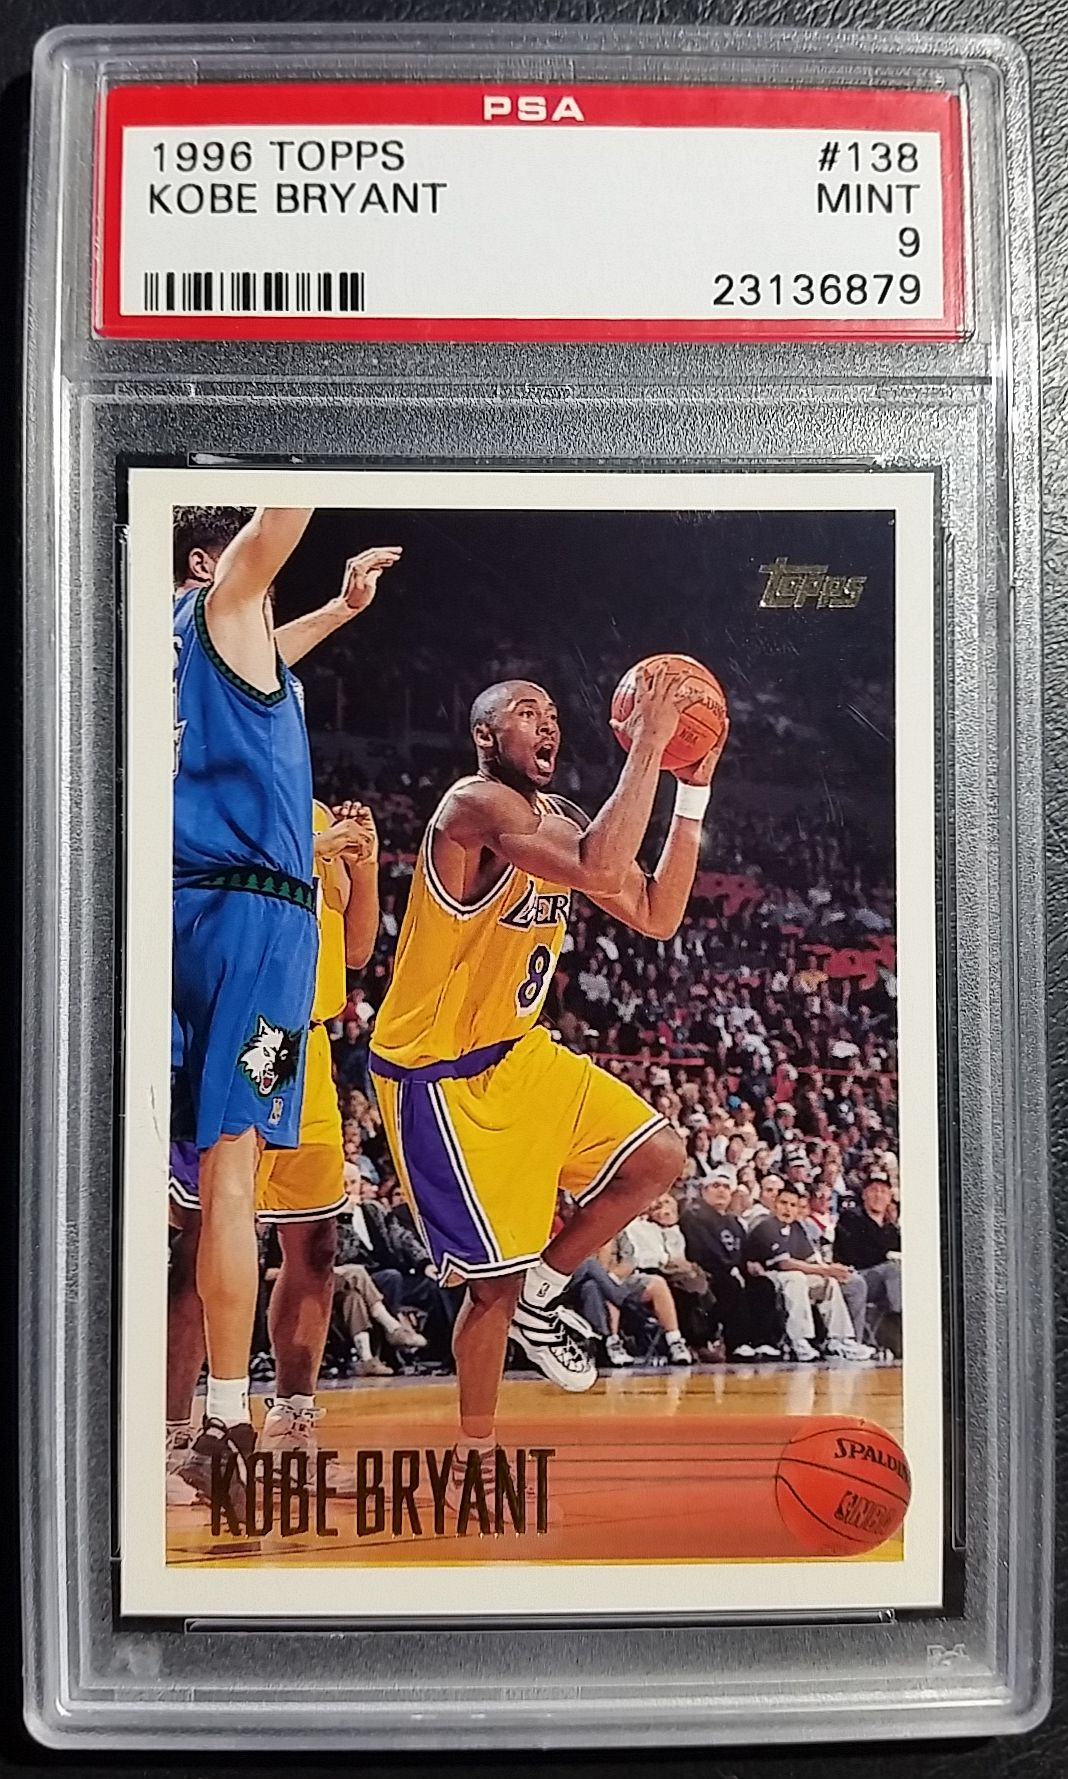 1996 topps basketball kobe bryant rookie card graded mint